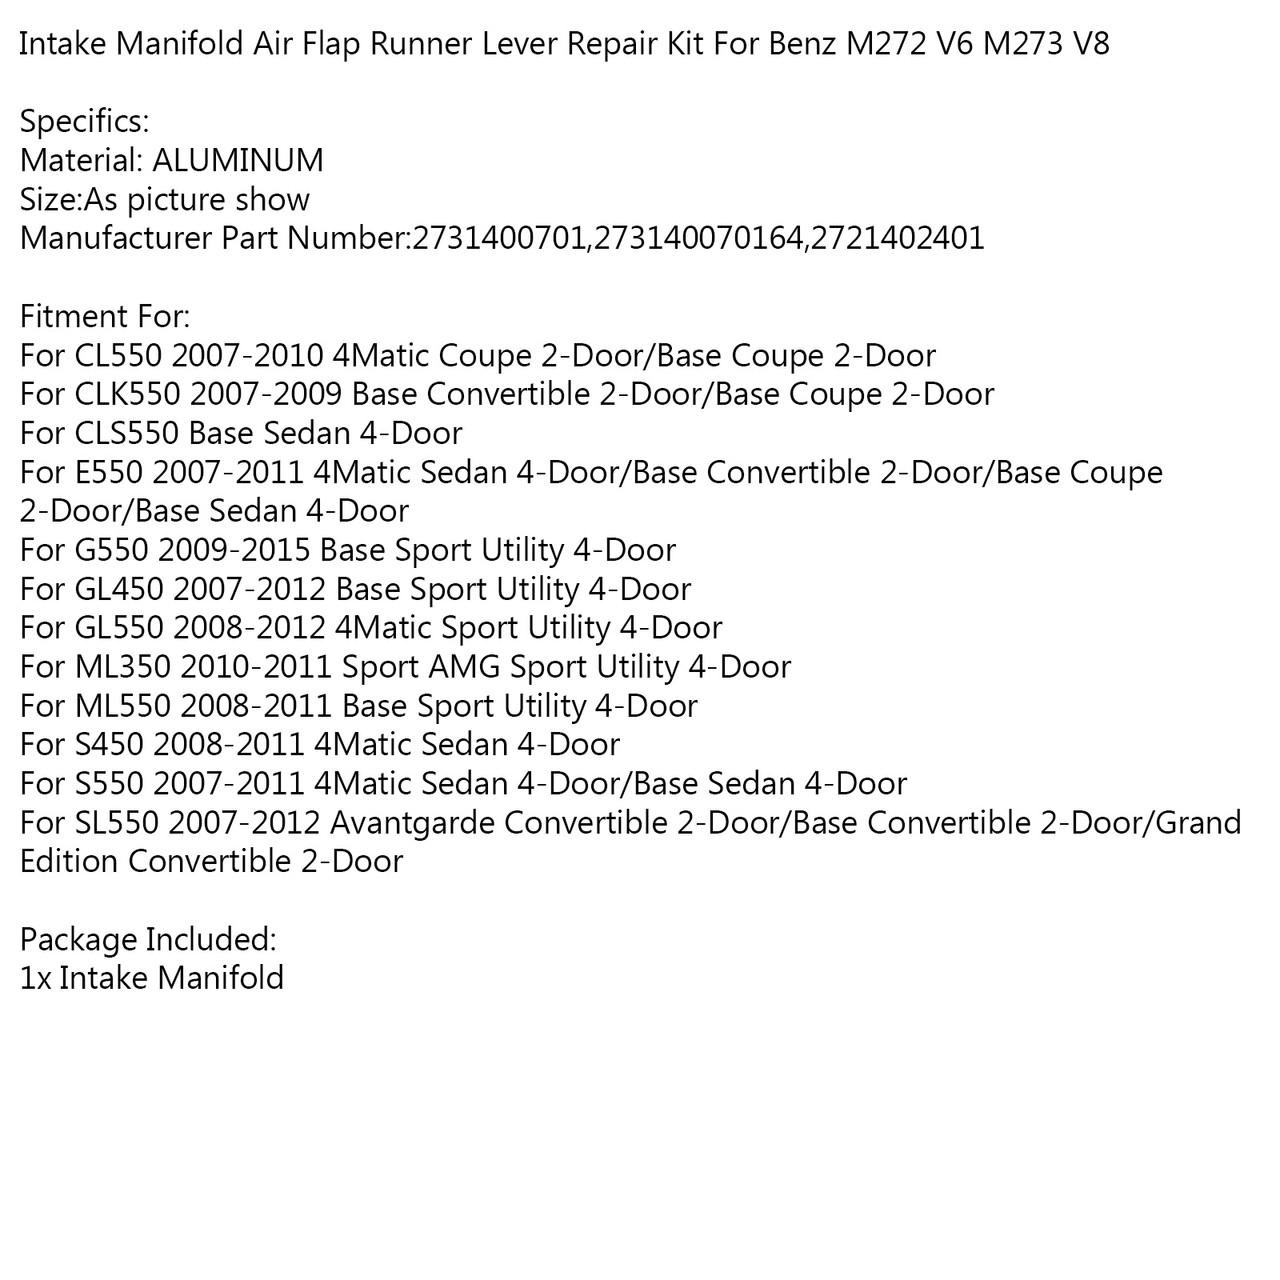 Intake Manifold Air Flap Runner Lever Repair Kit For Benz CL550 07-10 CLK550 07-09 CLS550 E550 07-11 G550 09-15 GL450 07-12 GL550 08-12 ML350 10-11 ML550 08-11